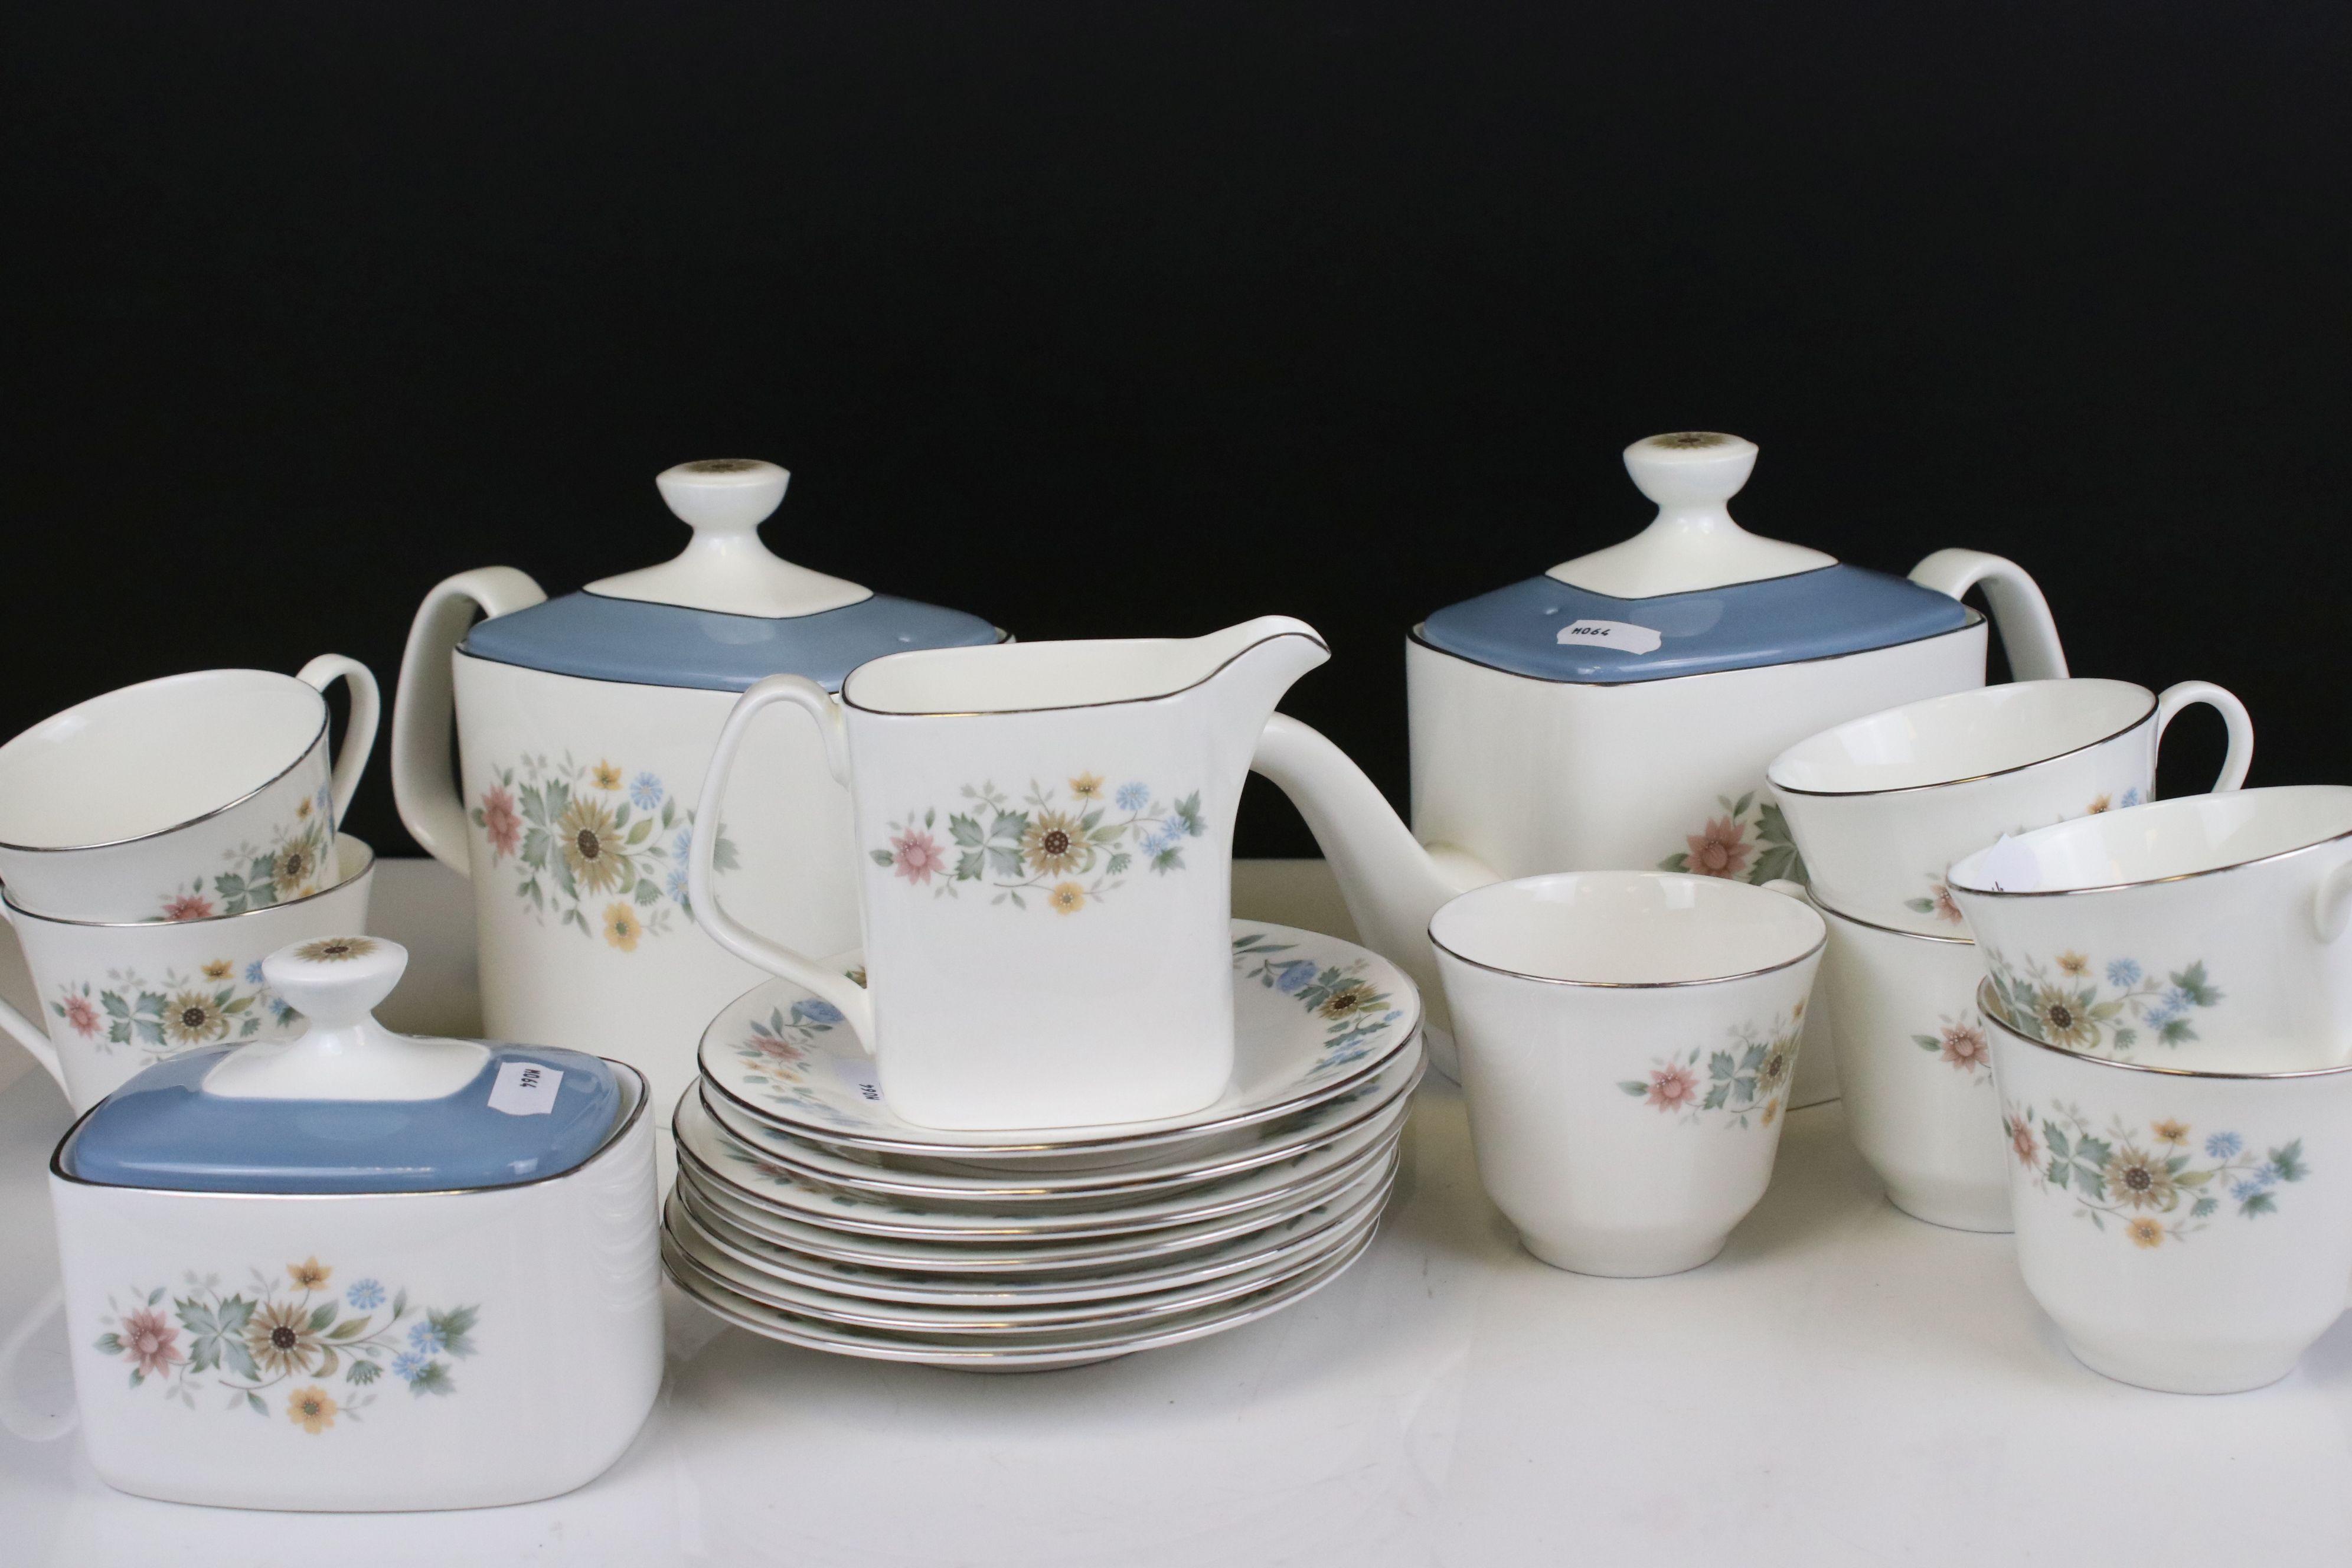 Royal Doulton ' Pastorale ' Tea Set comprising Two Teapots, Milk, Sugar, 6 Cups and 7 Saucers